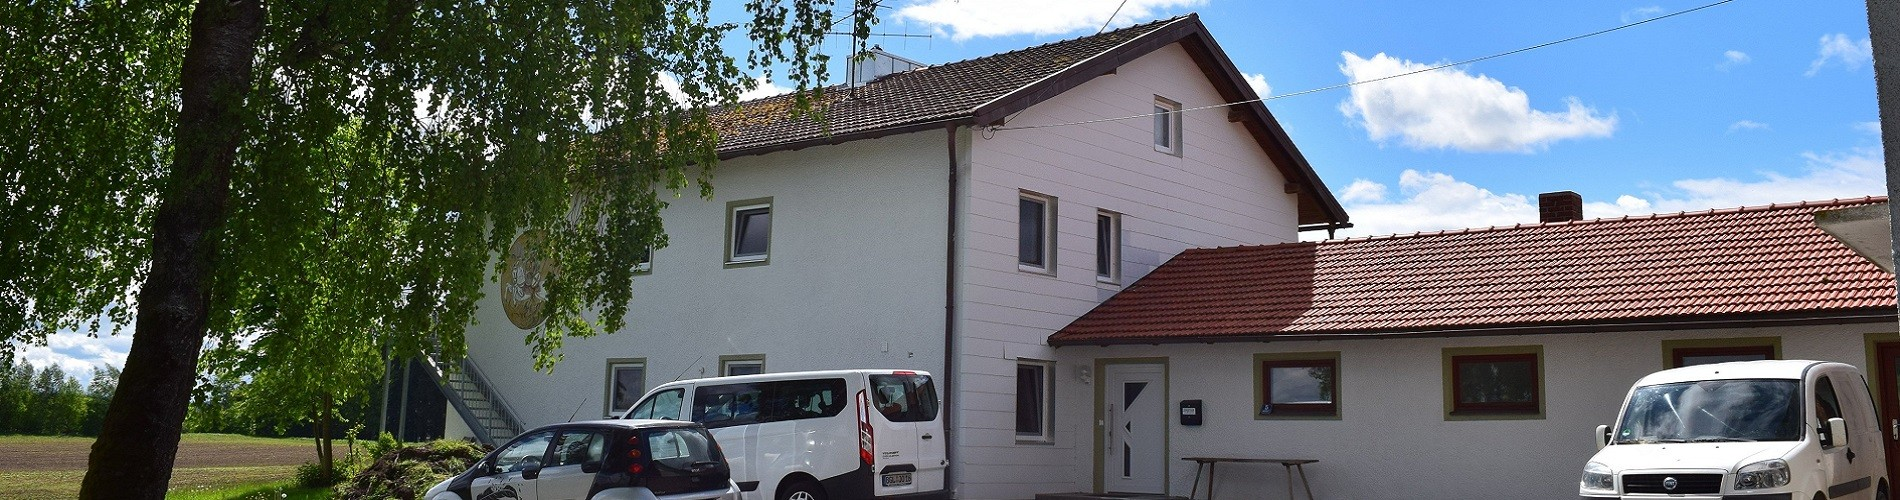 Haus_Neudorf